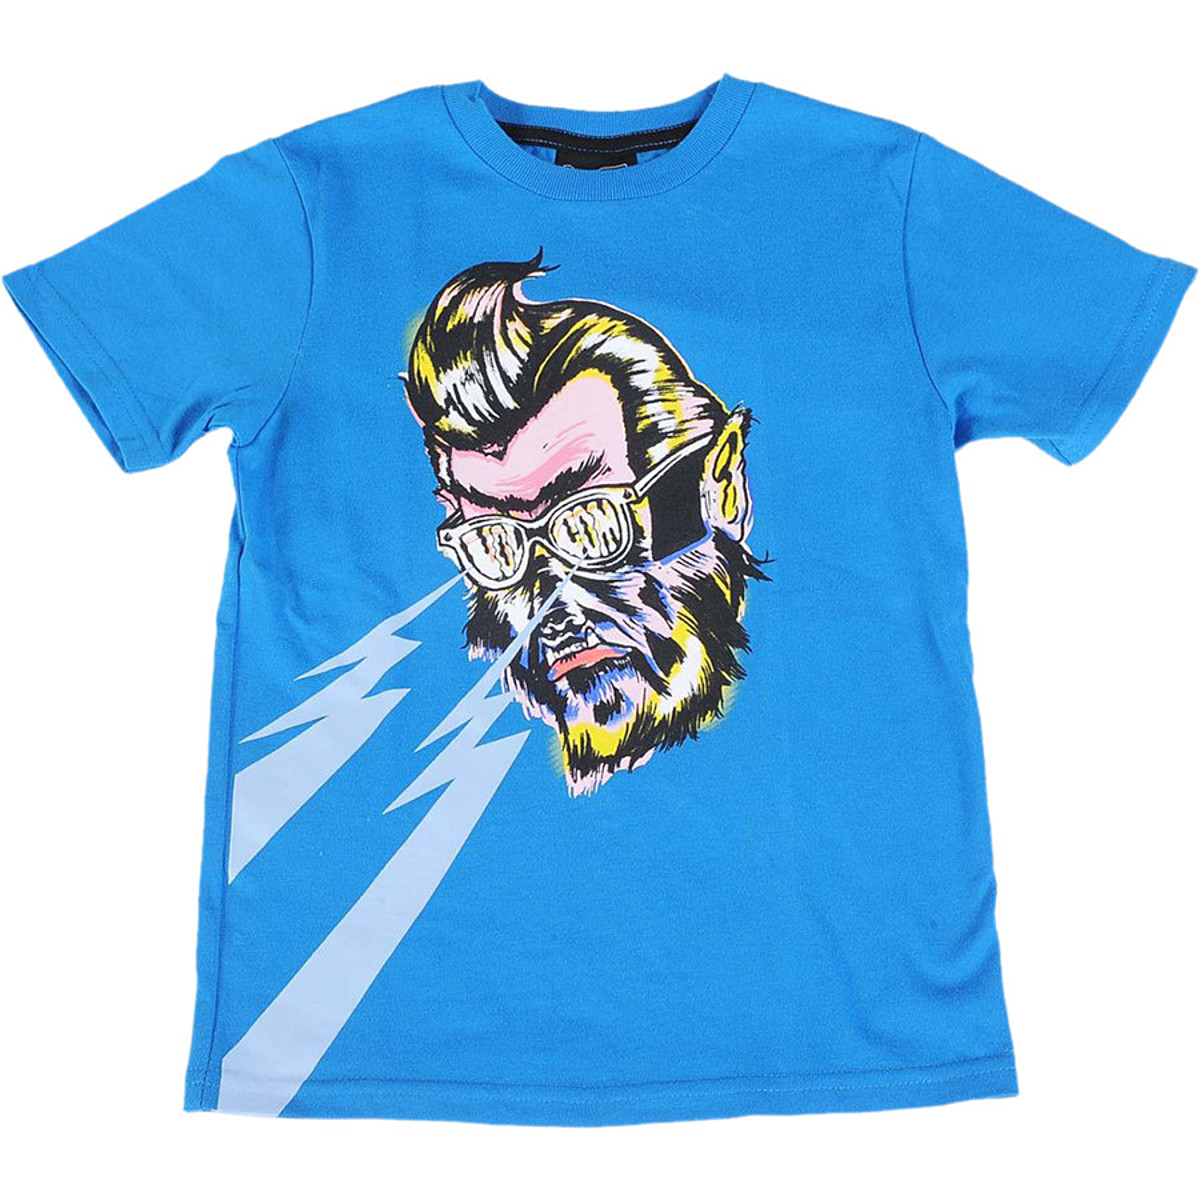 Volcom Shawn Higgins Wolf FA T-Shirt - Short-Sleeve - Toddler Boys'